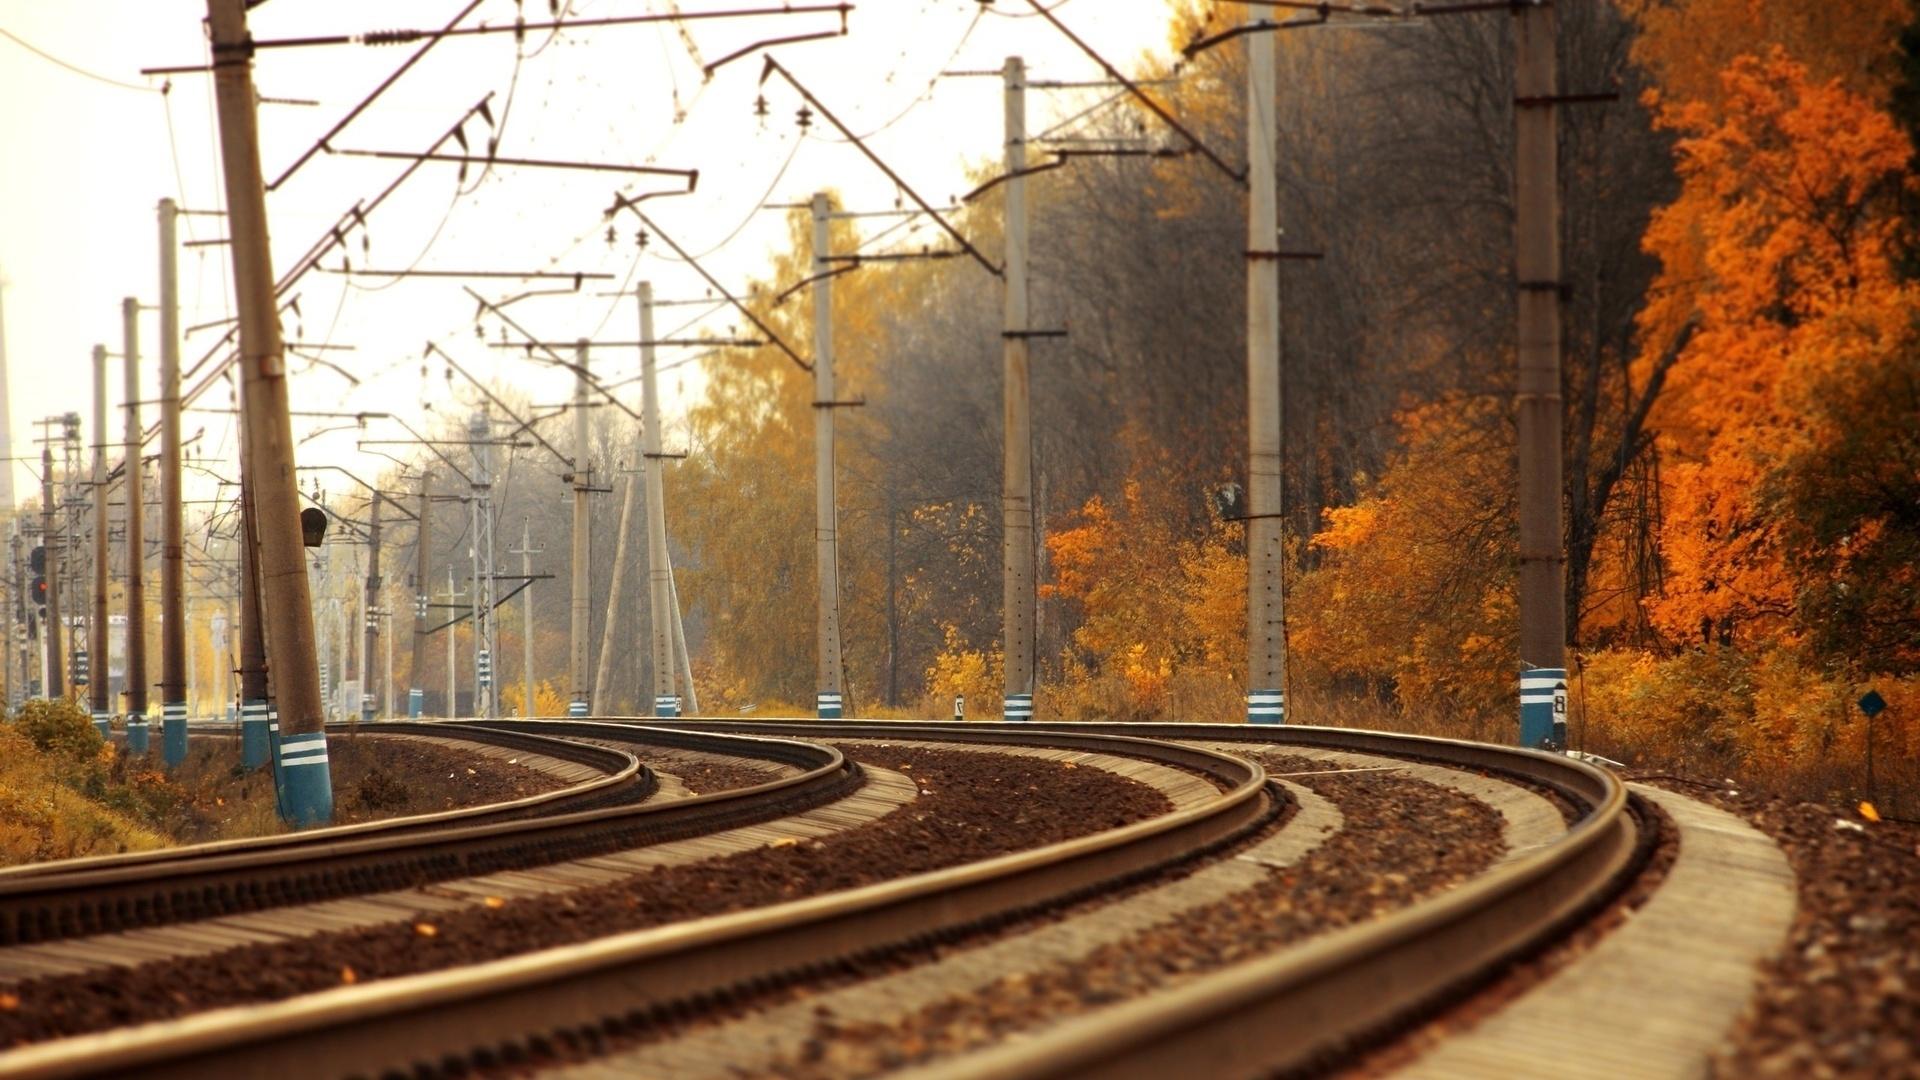 Railroad wallpaper photo hd